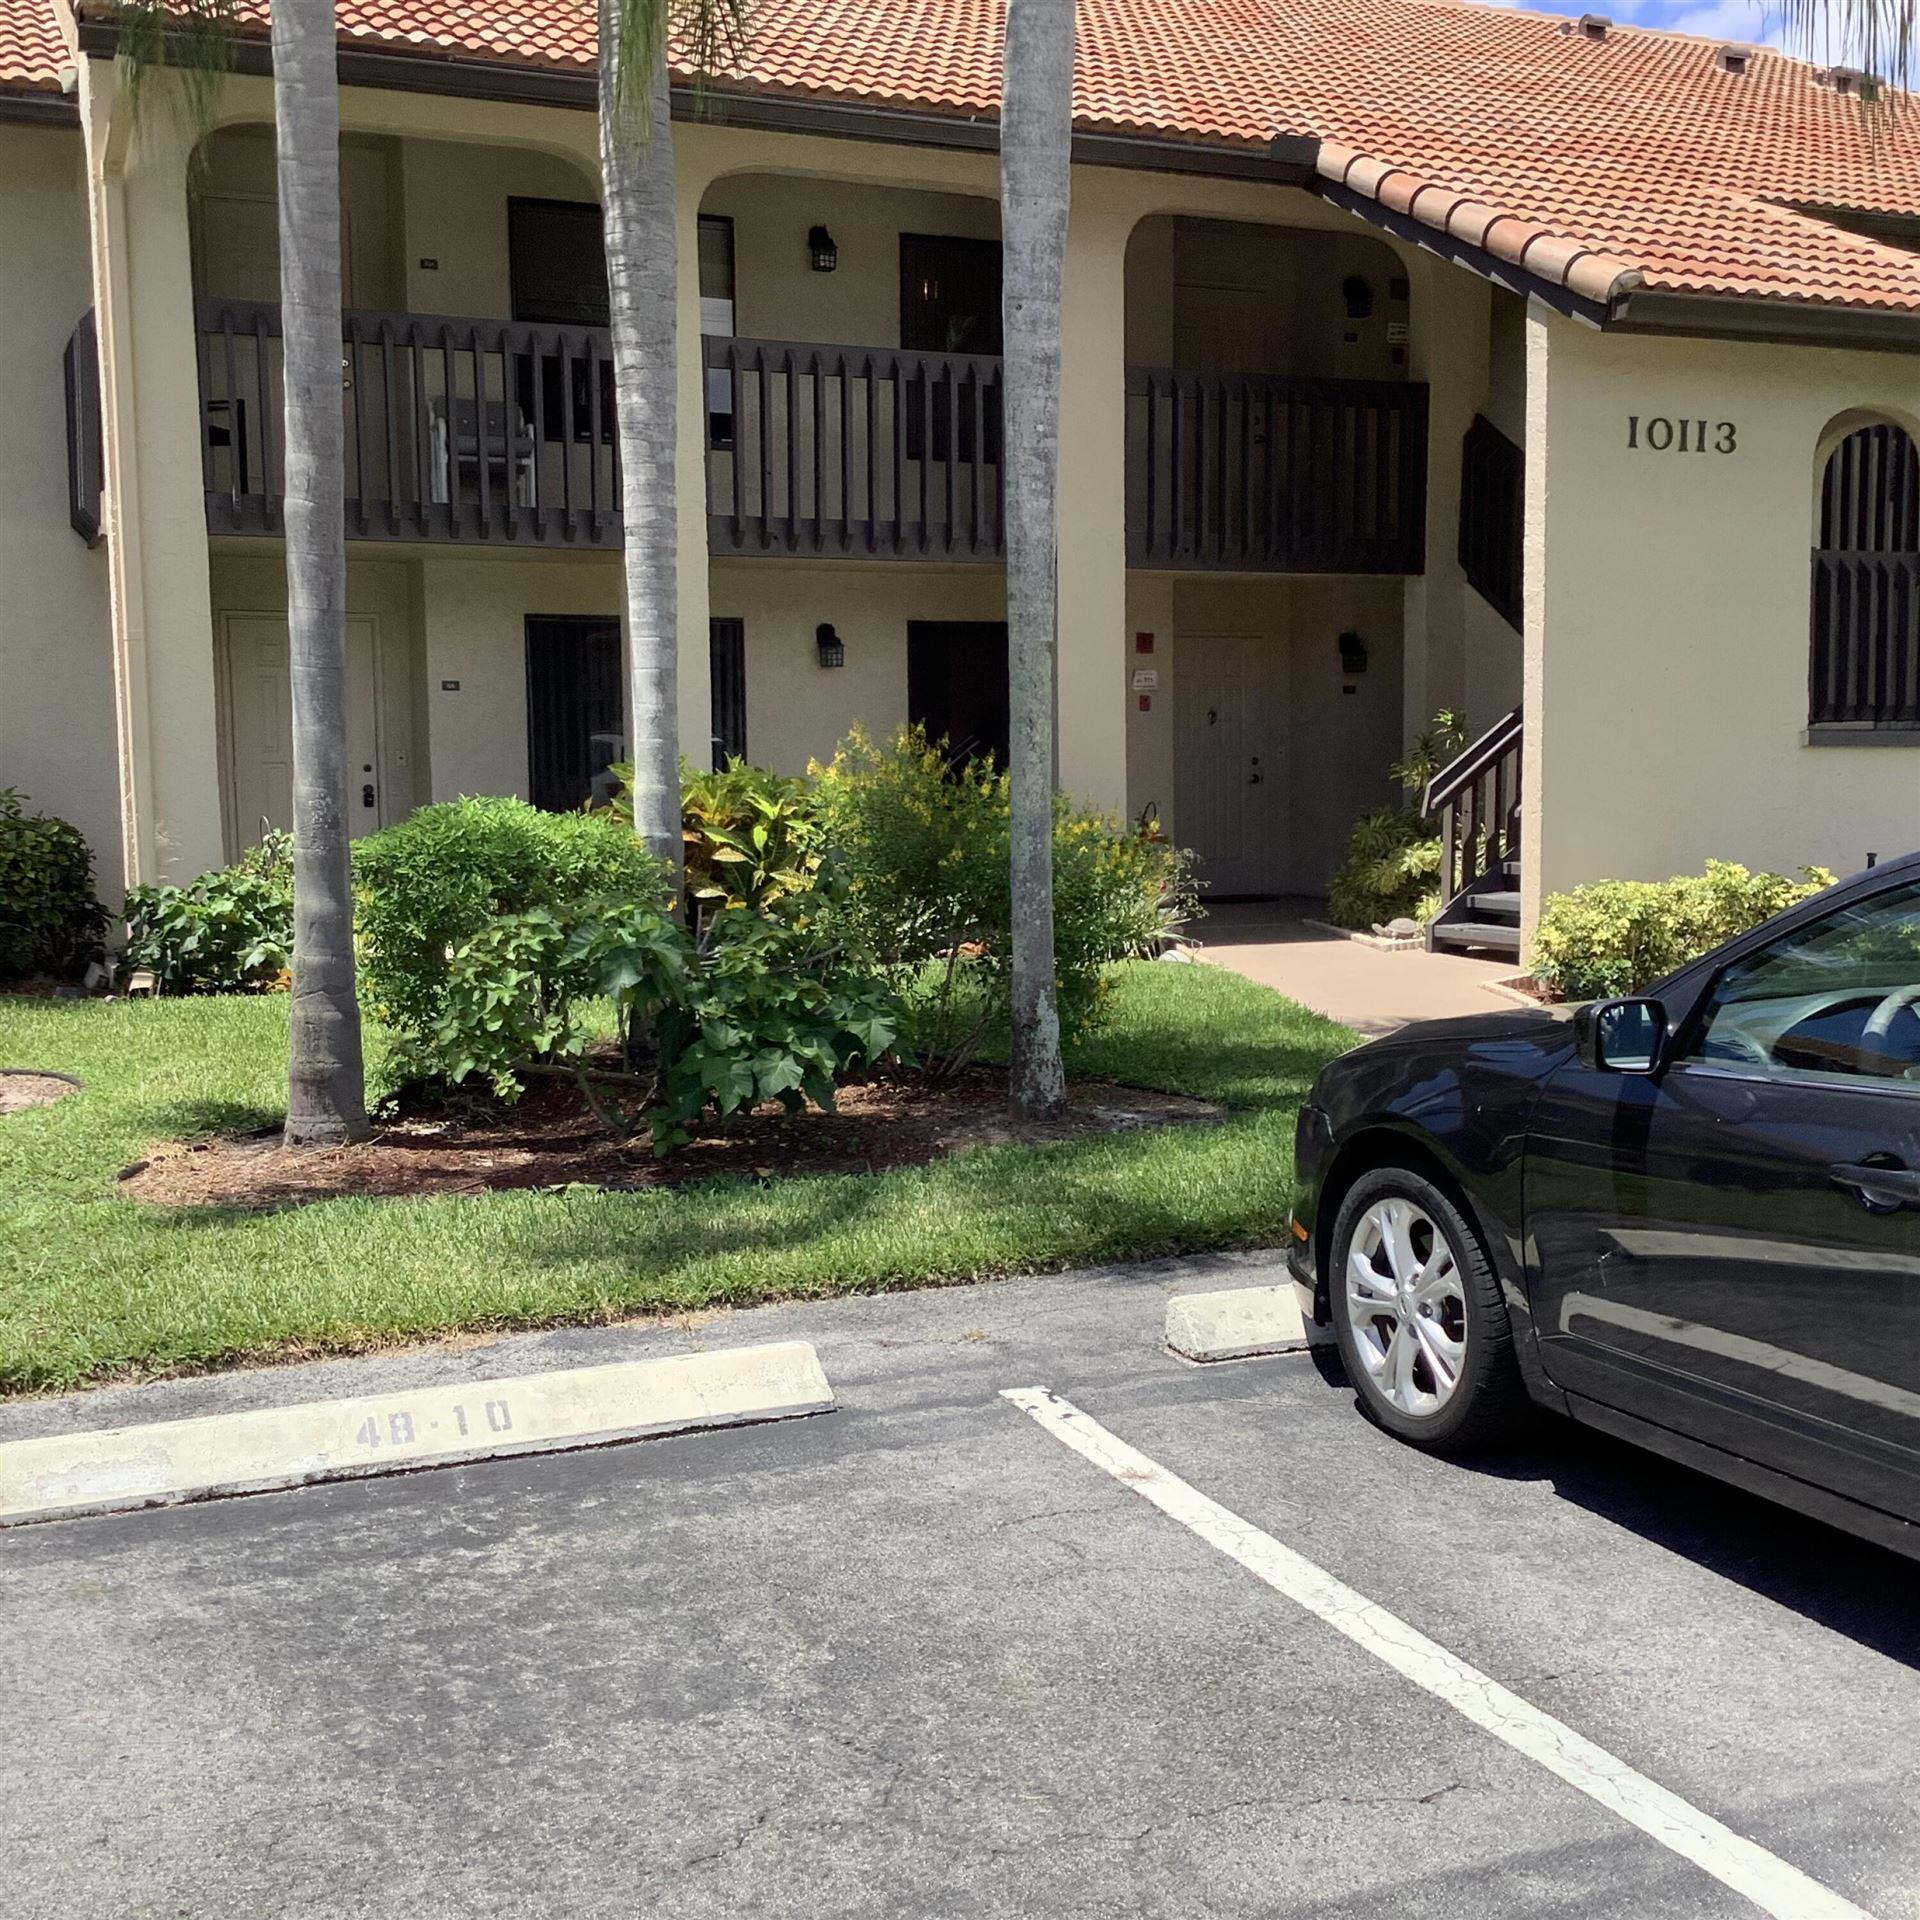 10113 Mangrove Drive #106, Boynton Beach, FL 33437 - MLS#: RX-10735475